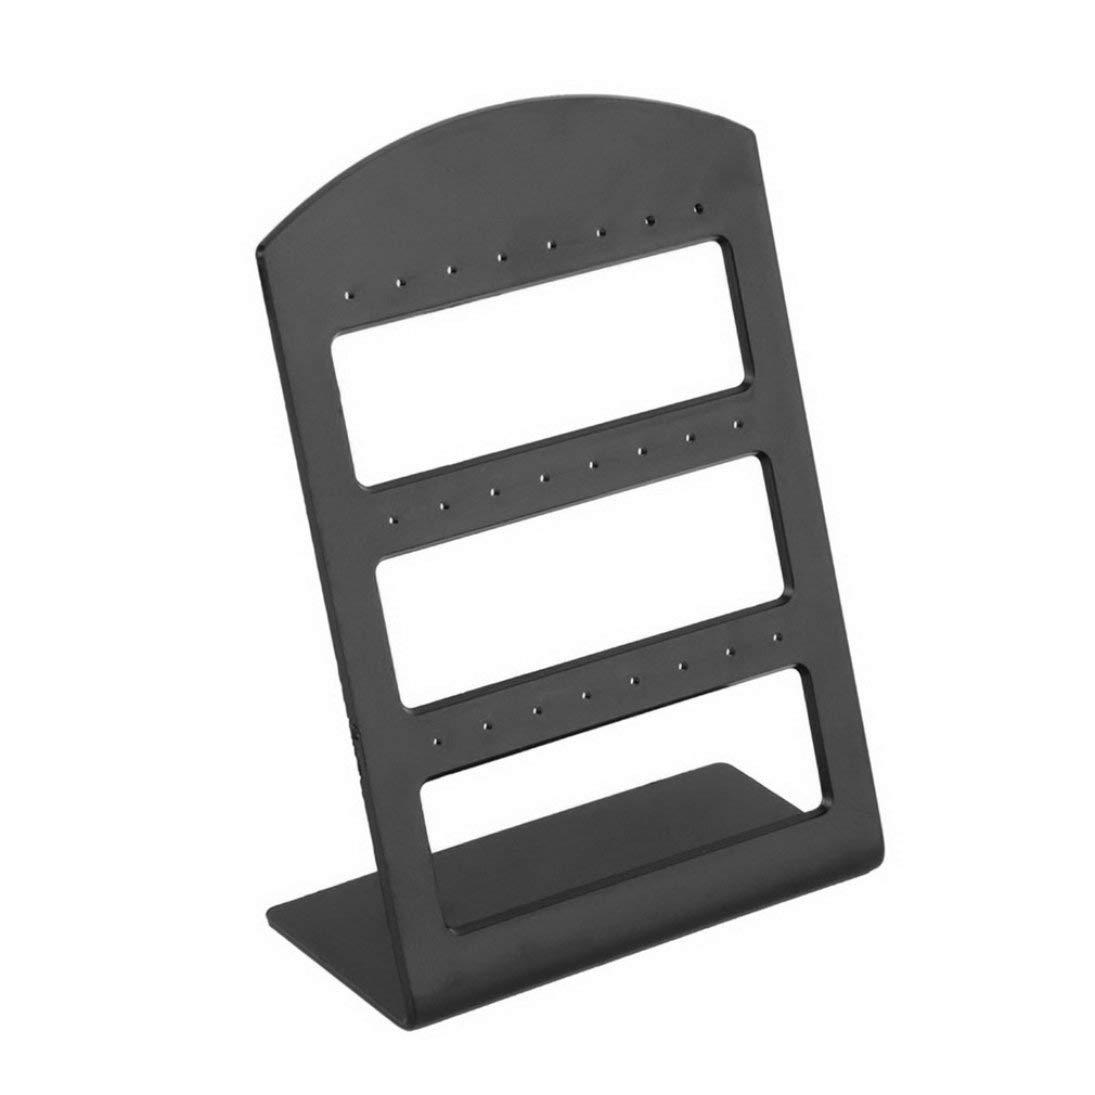 Baynne 24 Holes Plastic Earring Show Countertop Display Rack Stand Organizer Holder Jewelry Packaging /& Displays